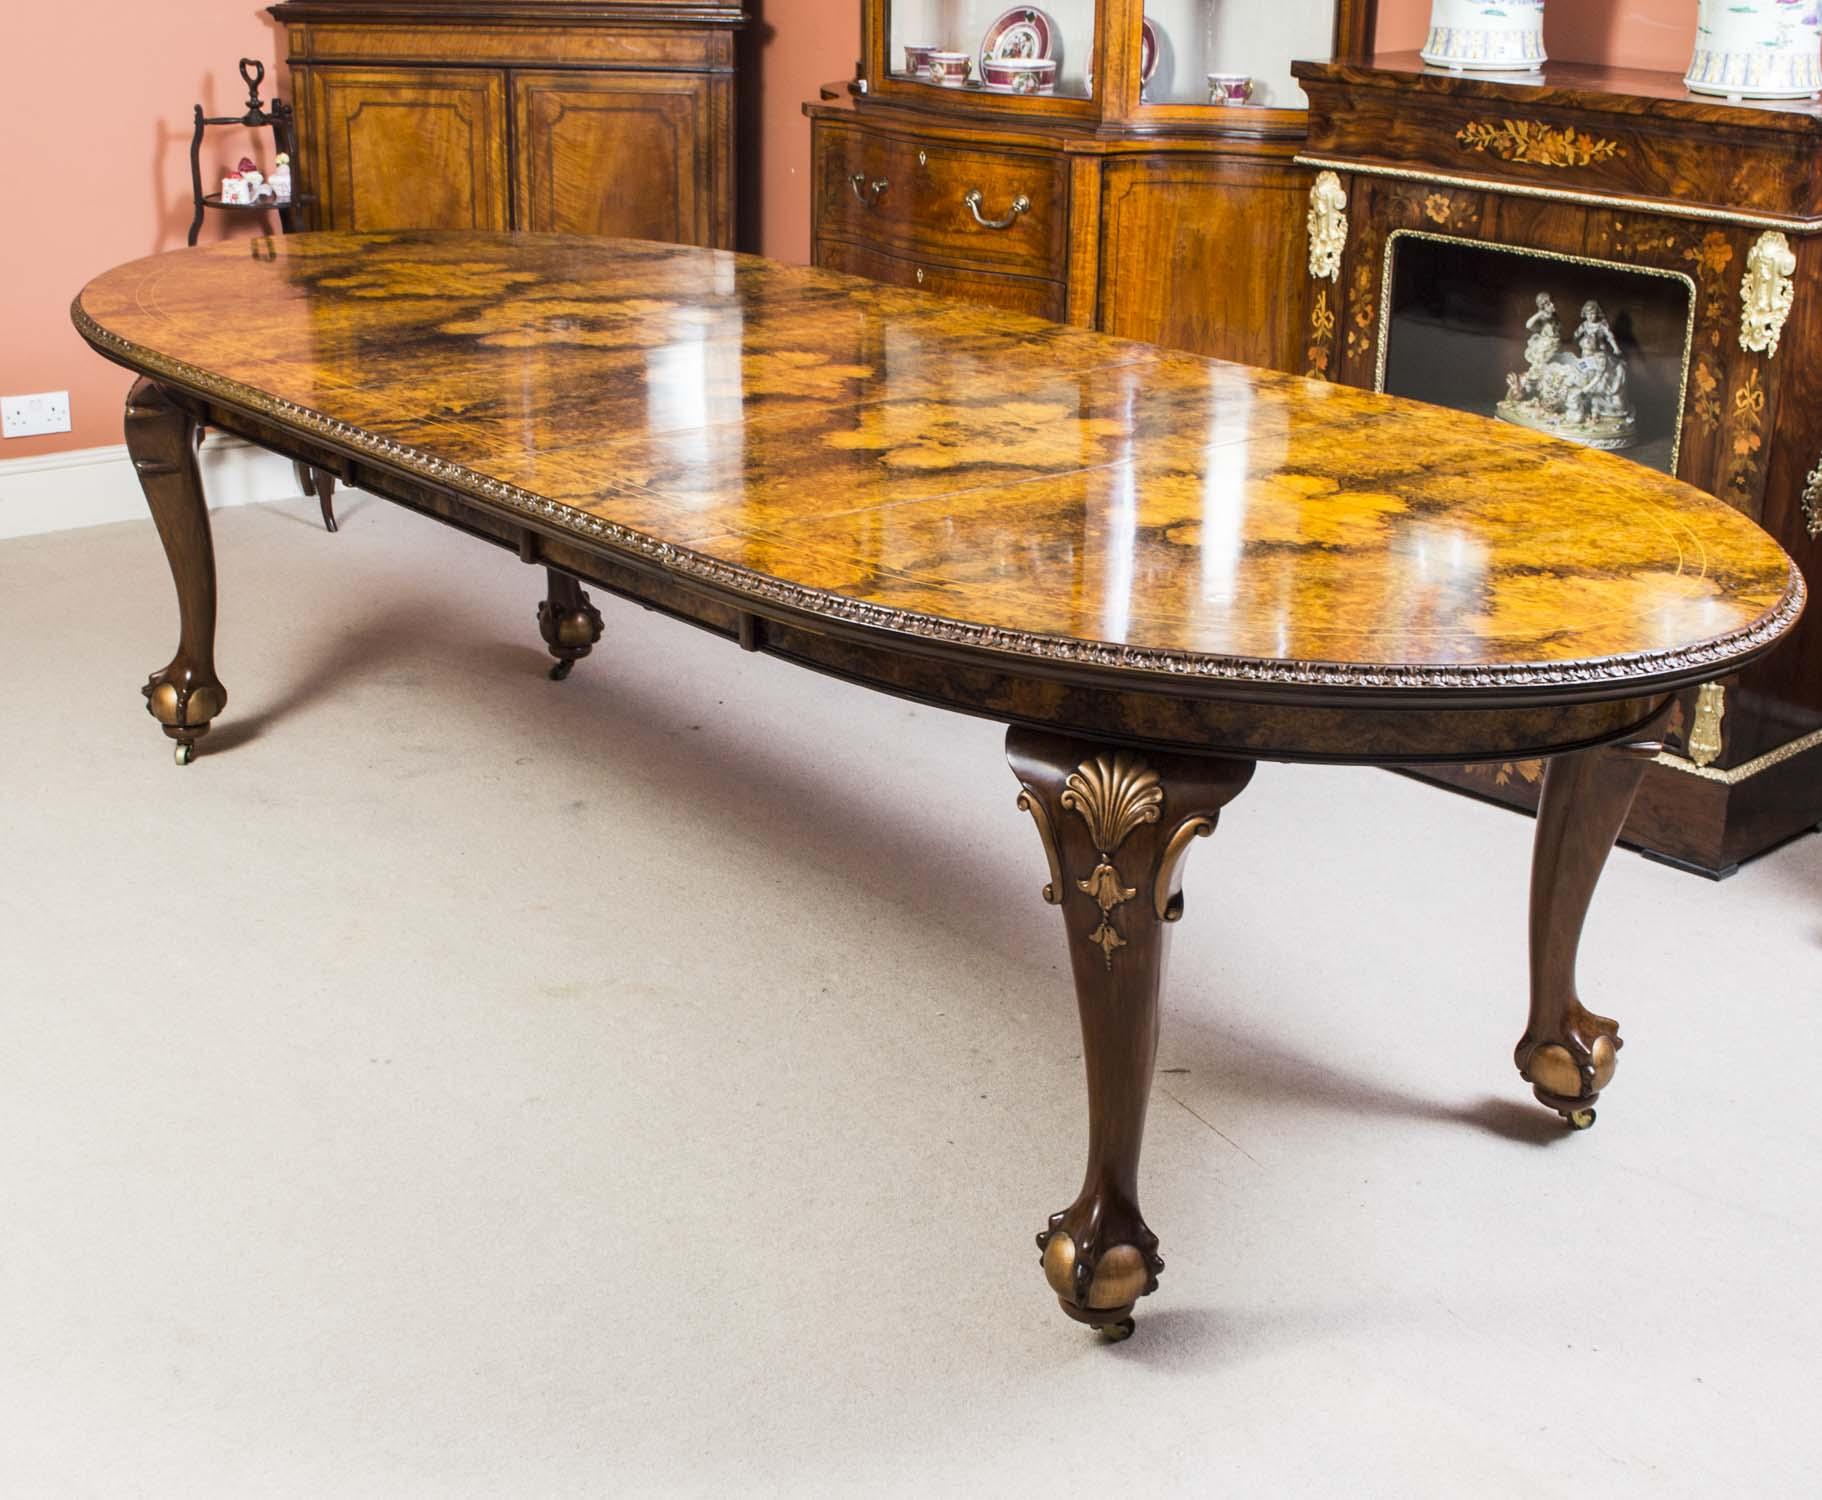 Modern queen anne furniture - Modern Queen Anne Furniture 77